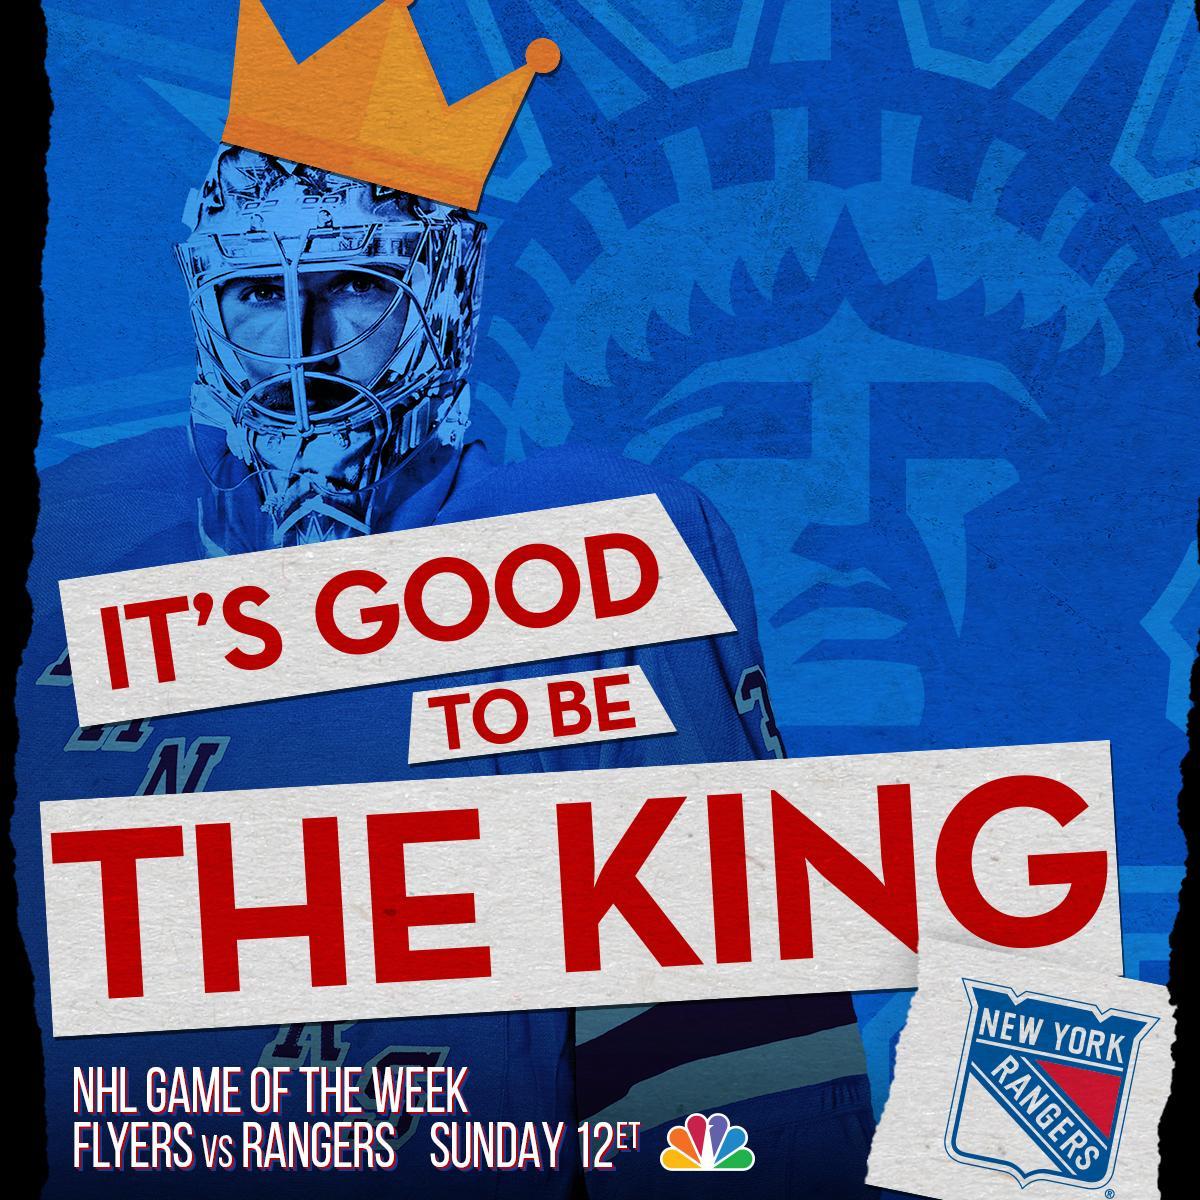 NHLonNBCSports king of new york